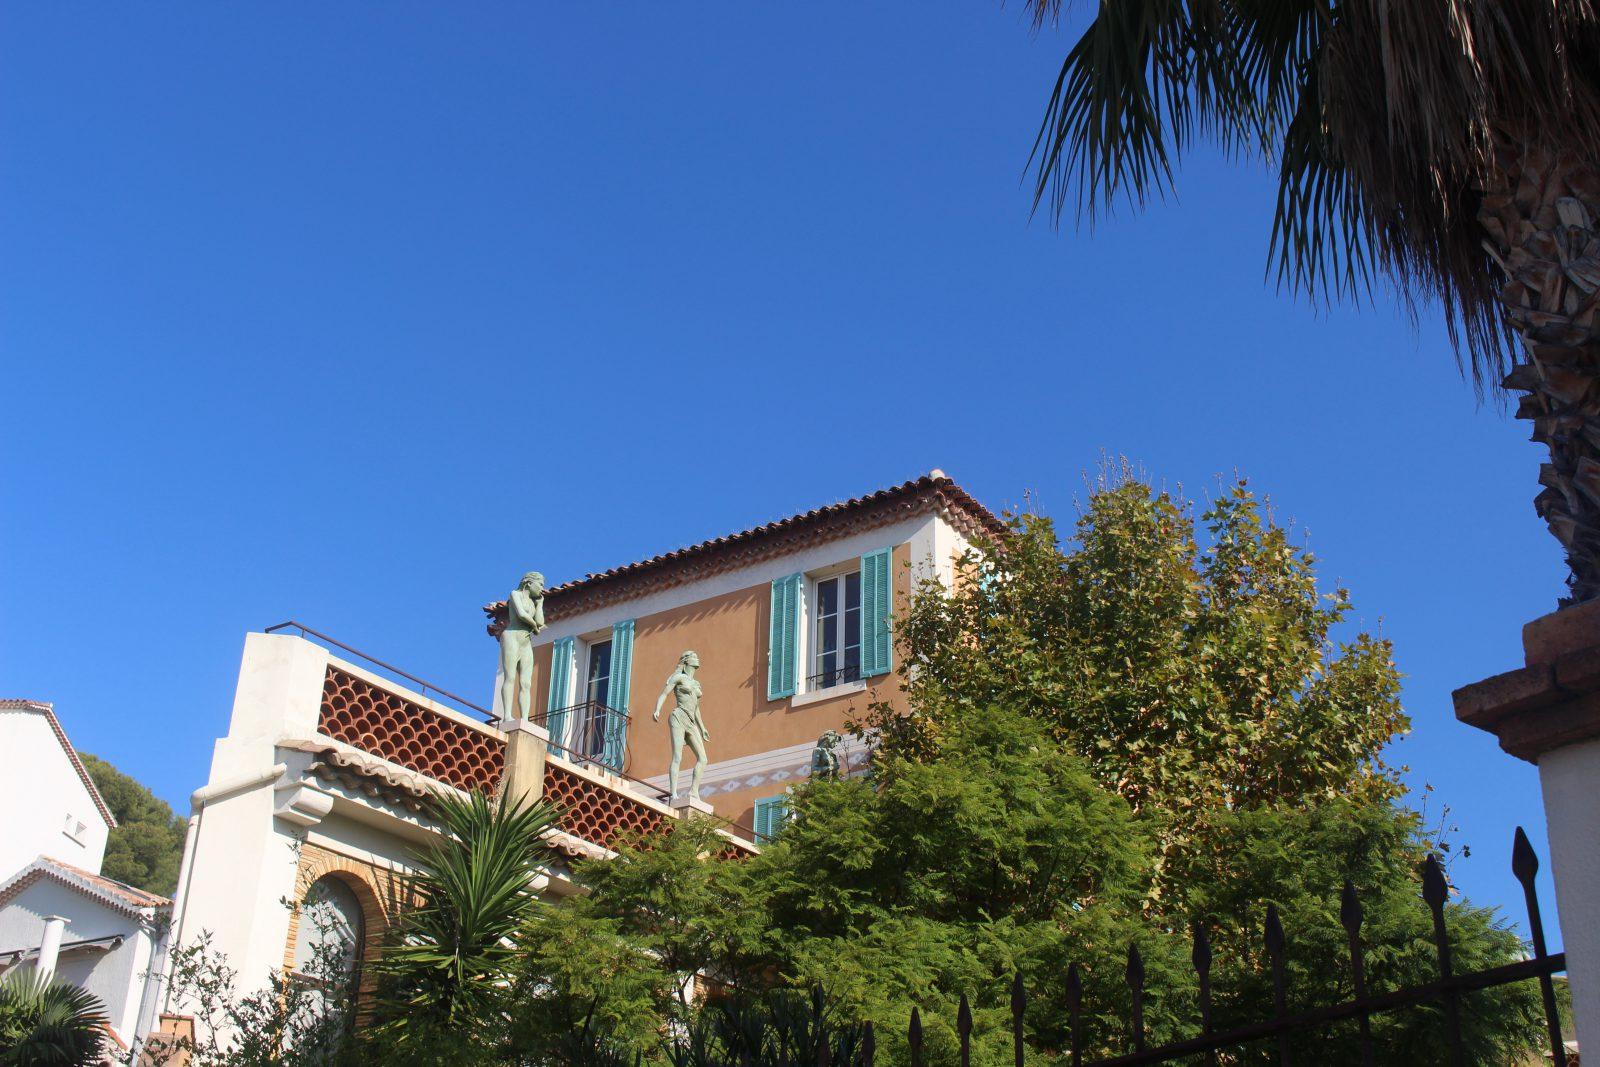 Cassis Villa Ariane statues ornant le toit de la bibliothèque municipale